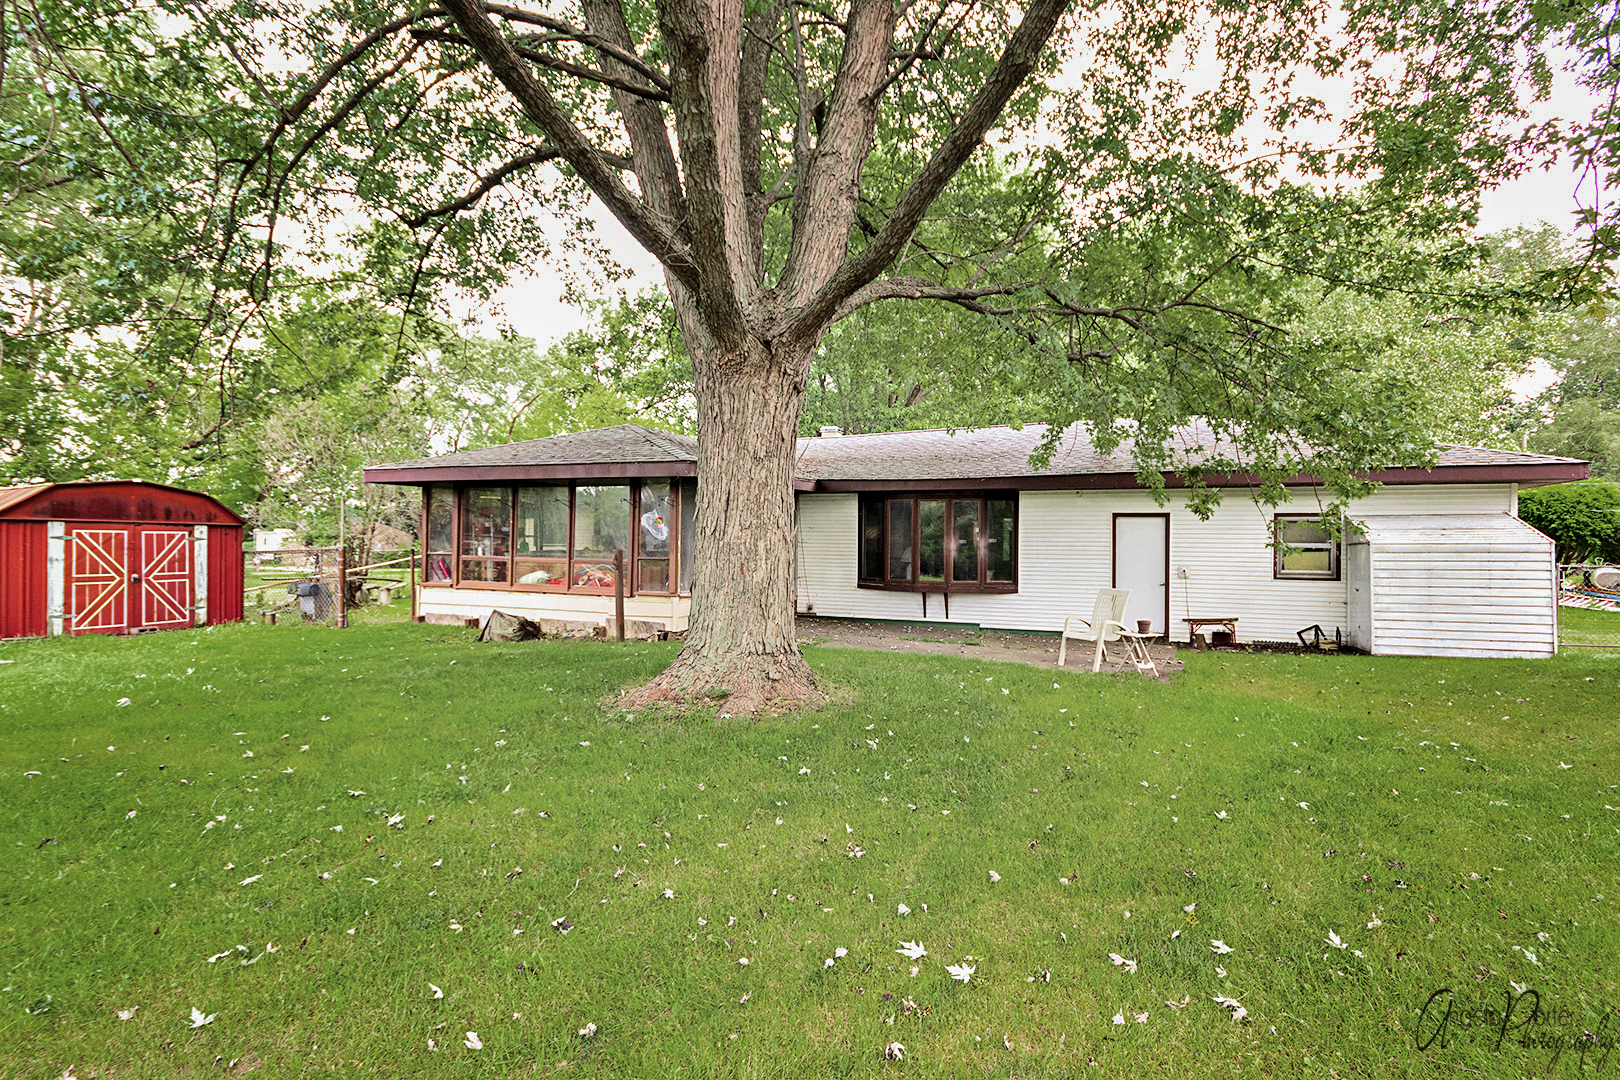 325 Croyden, Spring Grove, Illinois, 60081